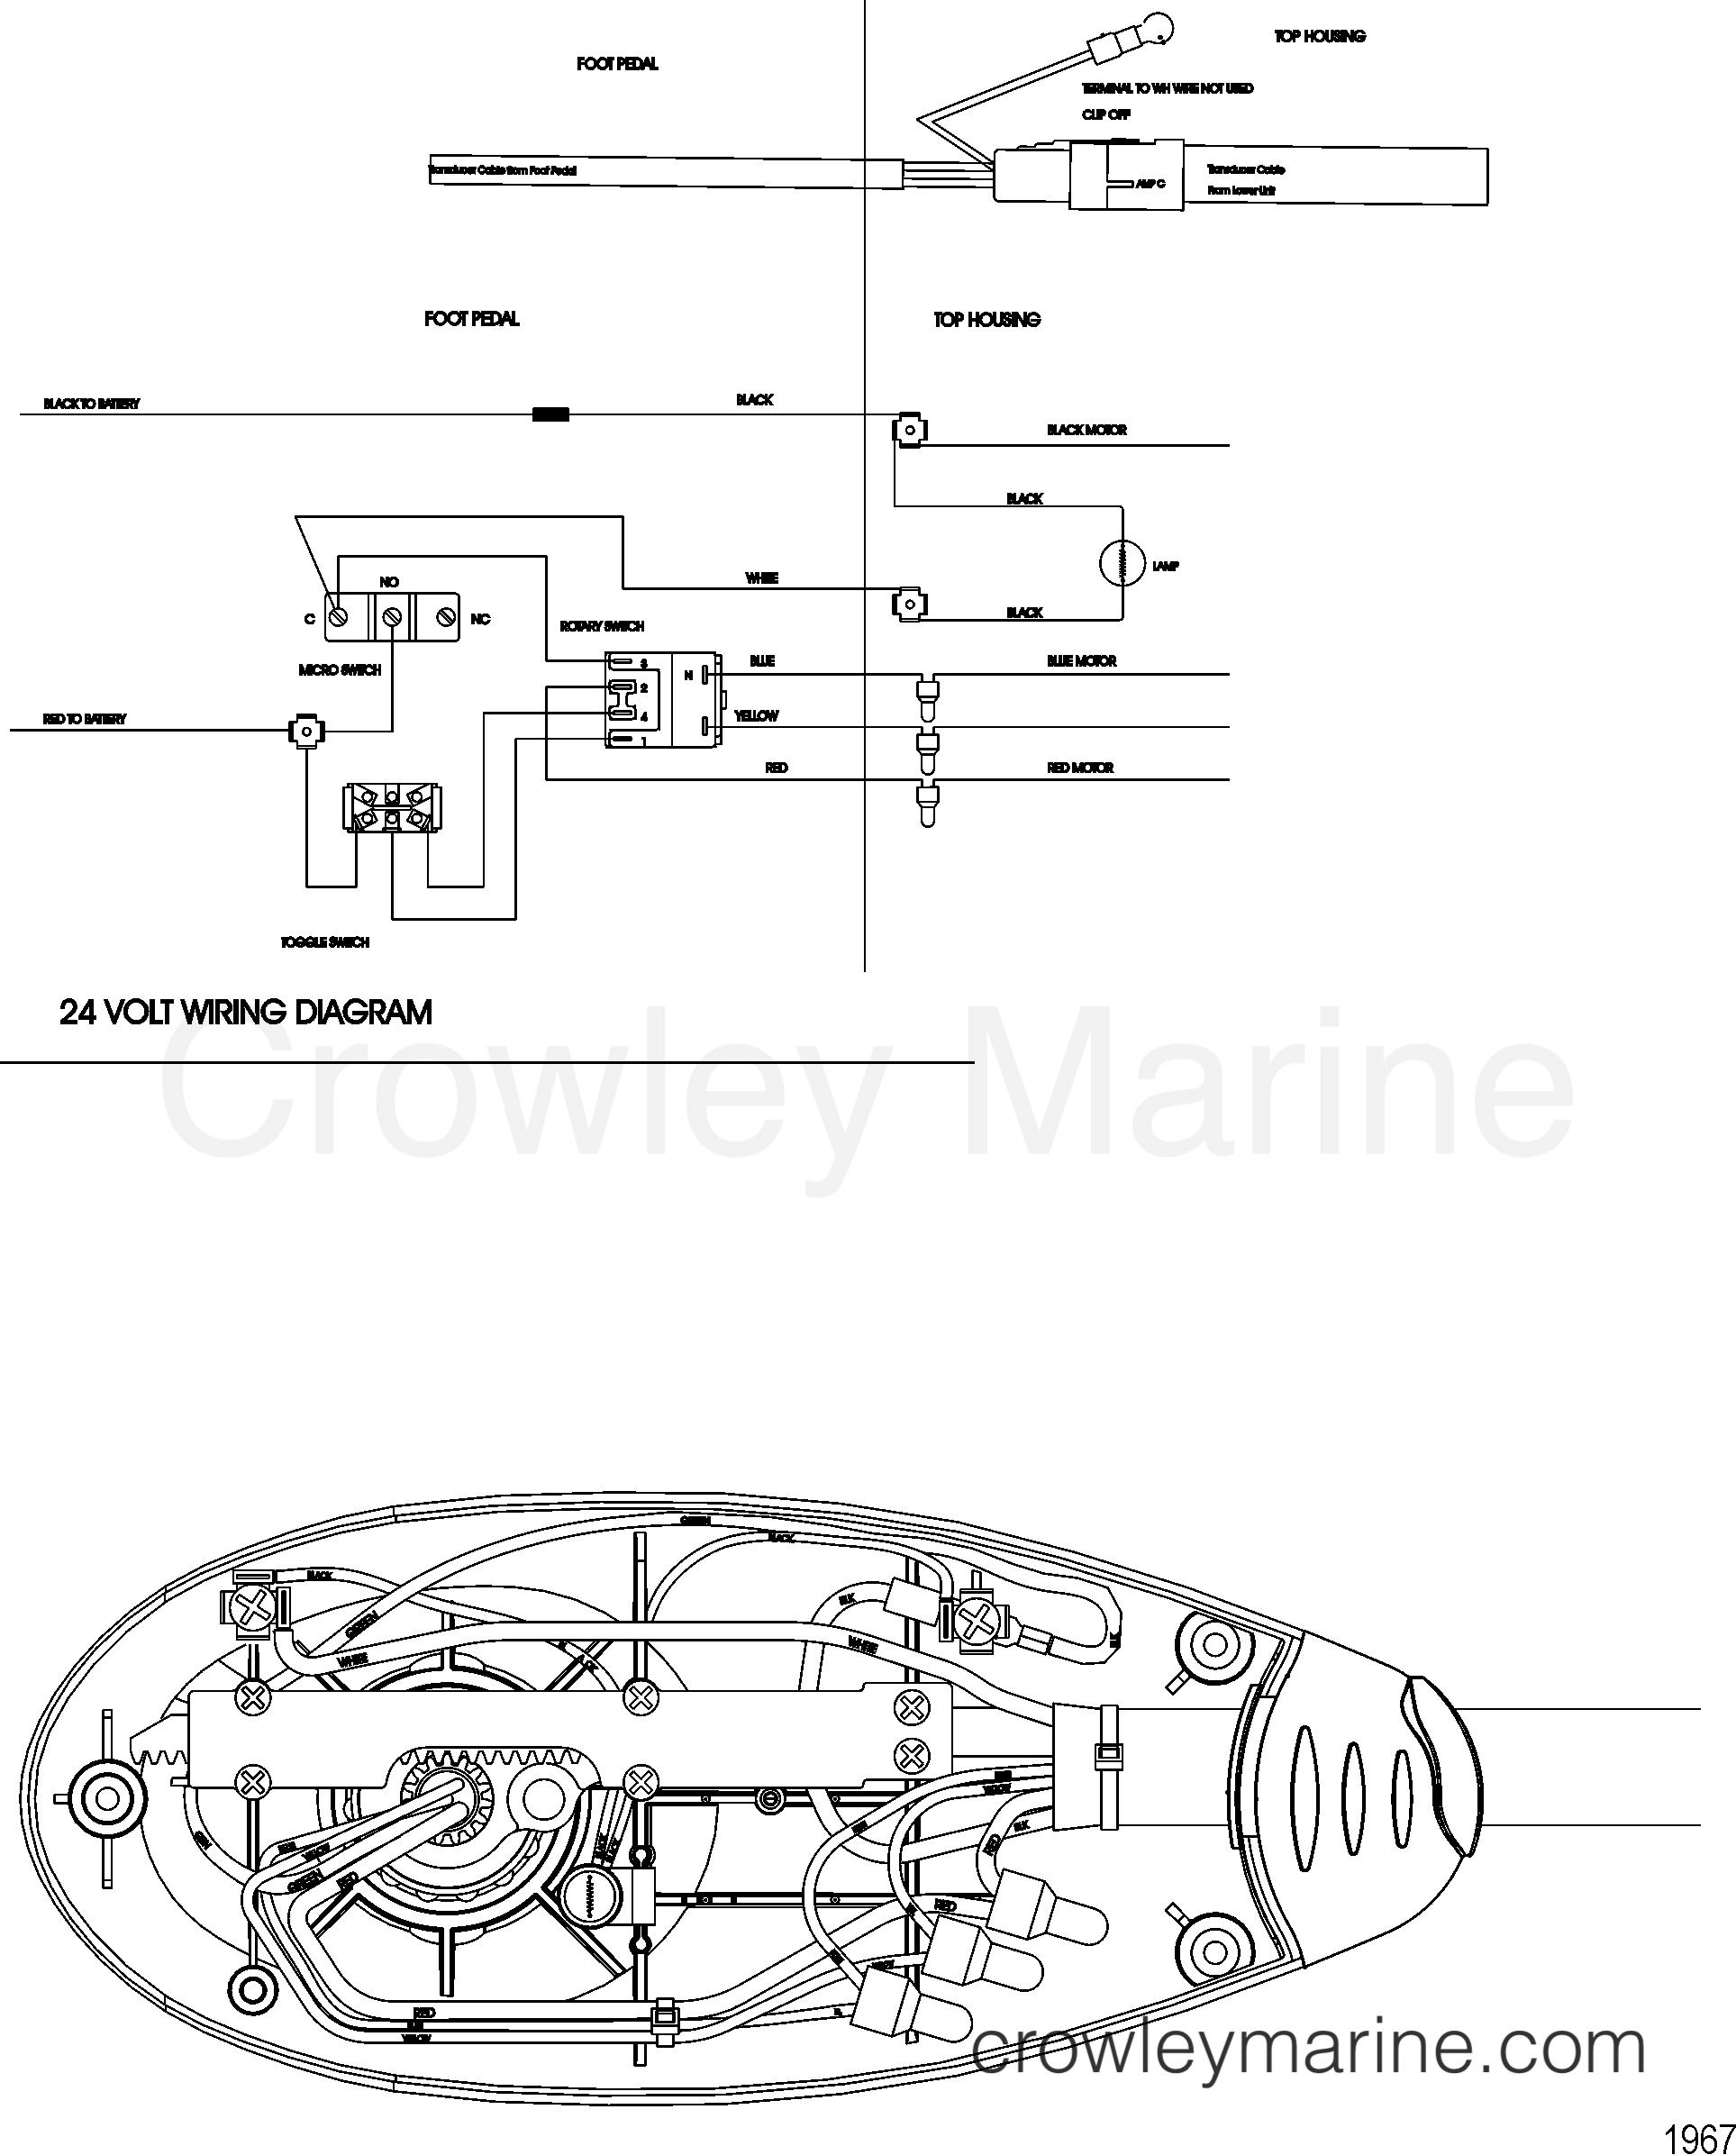 2010 MotorGuide 24V [MOTORGUIDE] - 921310440 - WIRE DIAGRAM(MODEL FW71PFB)